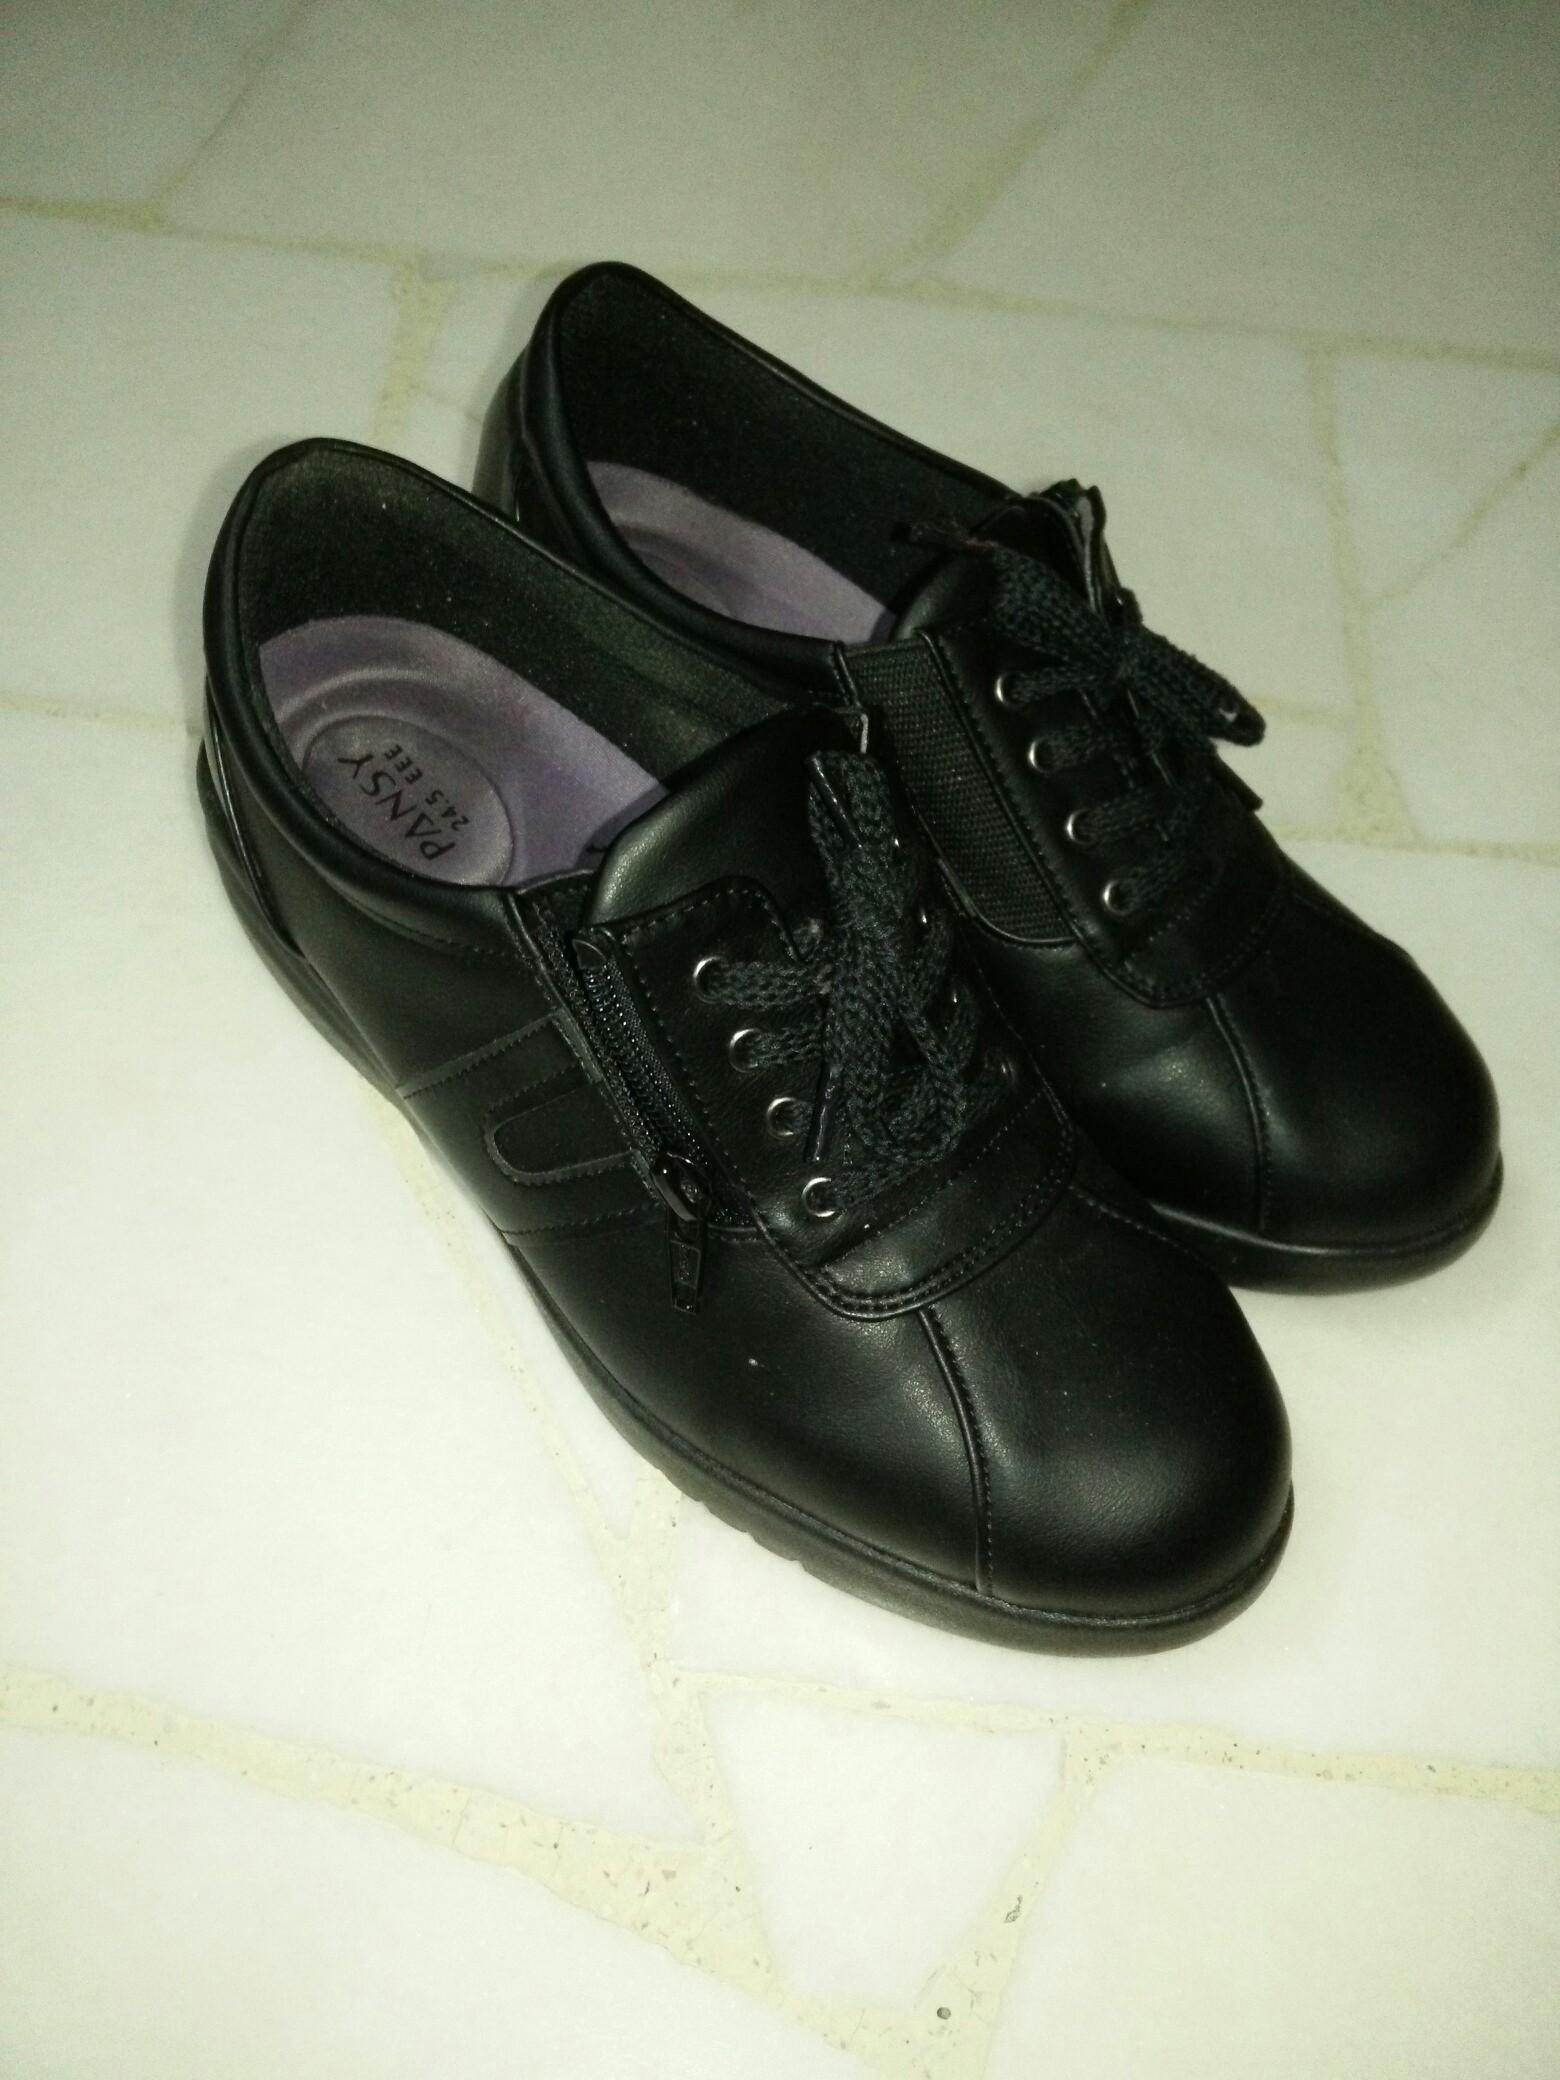 Pansy black comfort shoes EEE 24.5